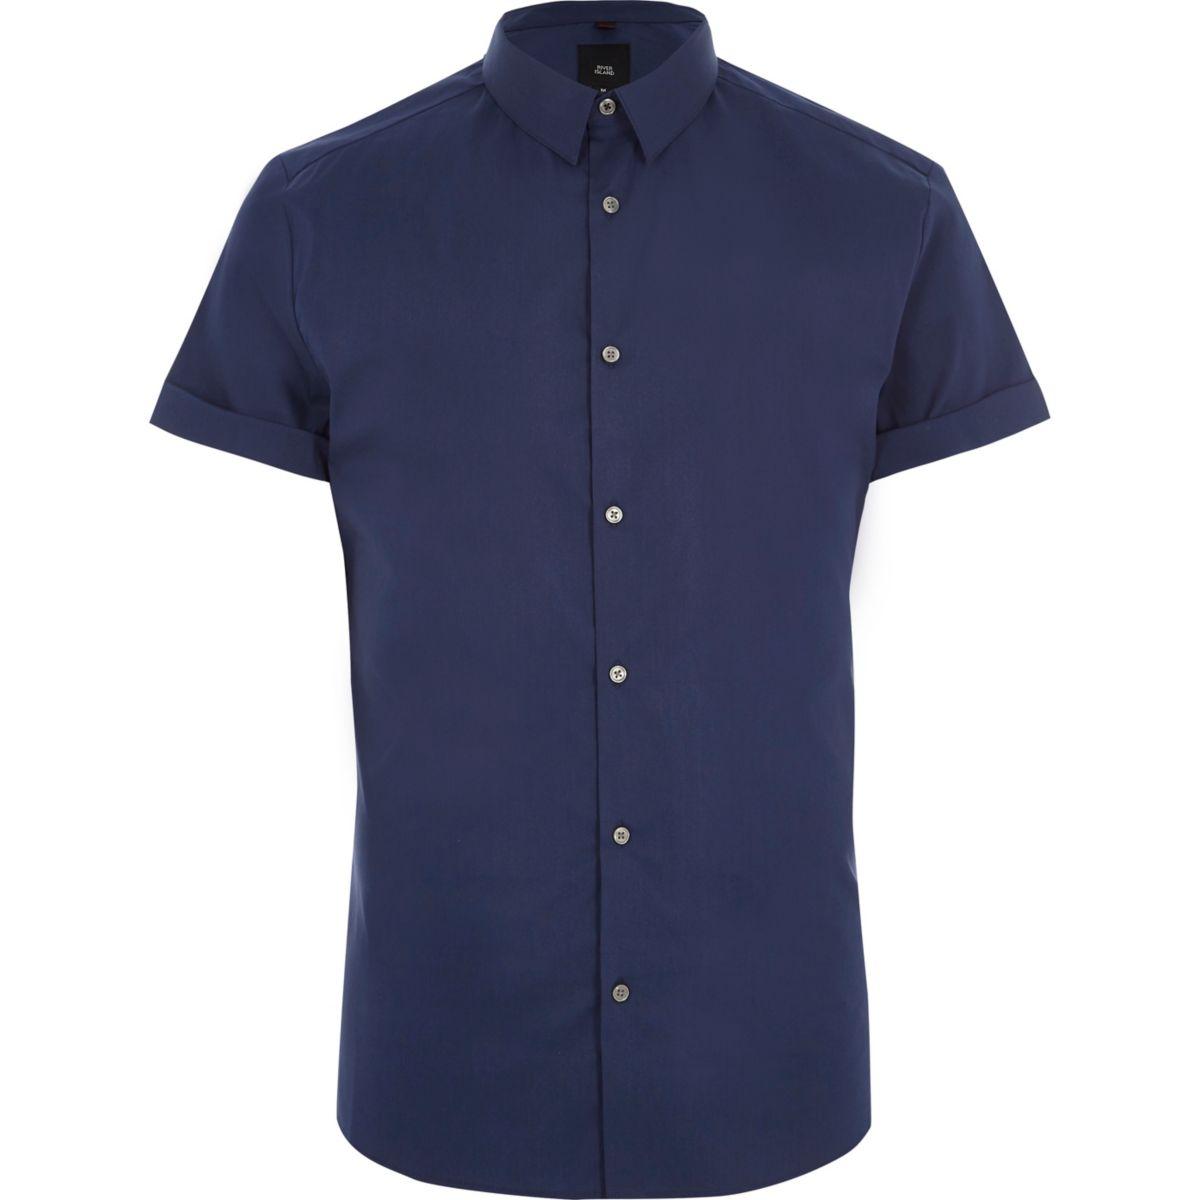 Blue muscle fit short sleeve shirt